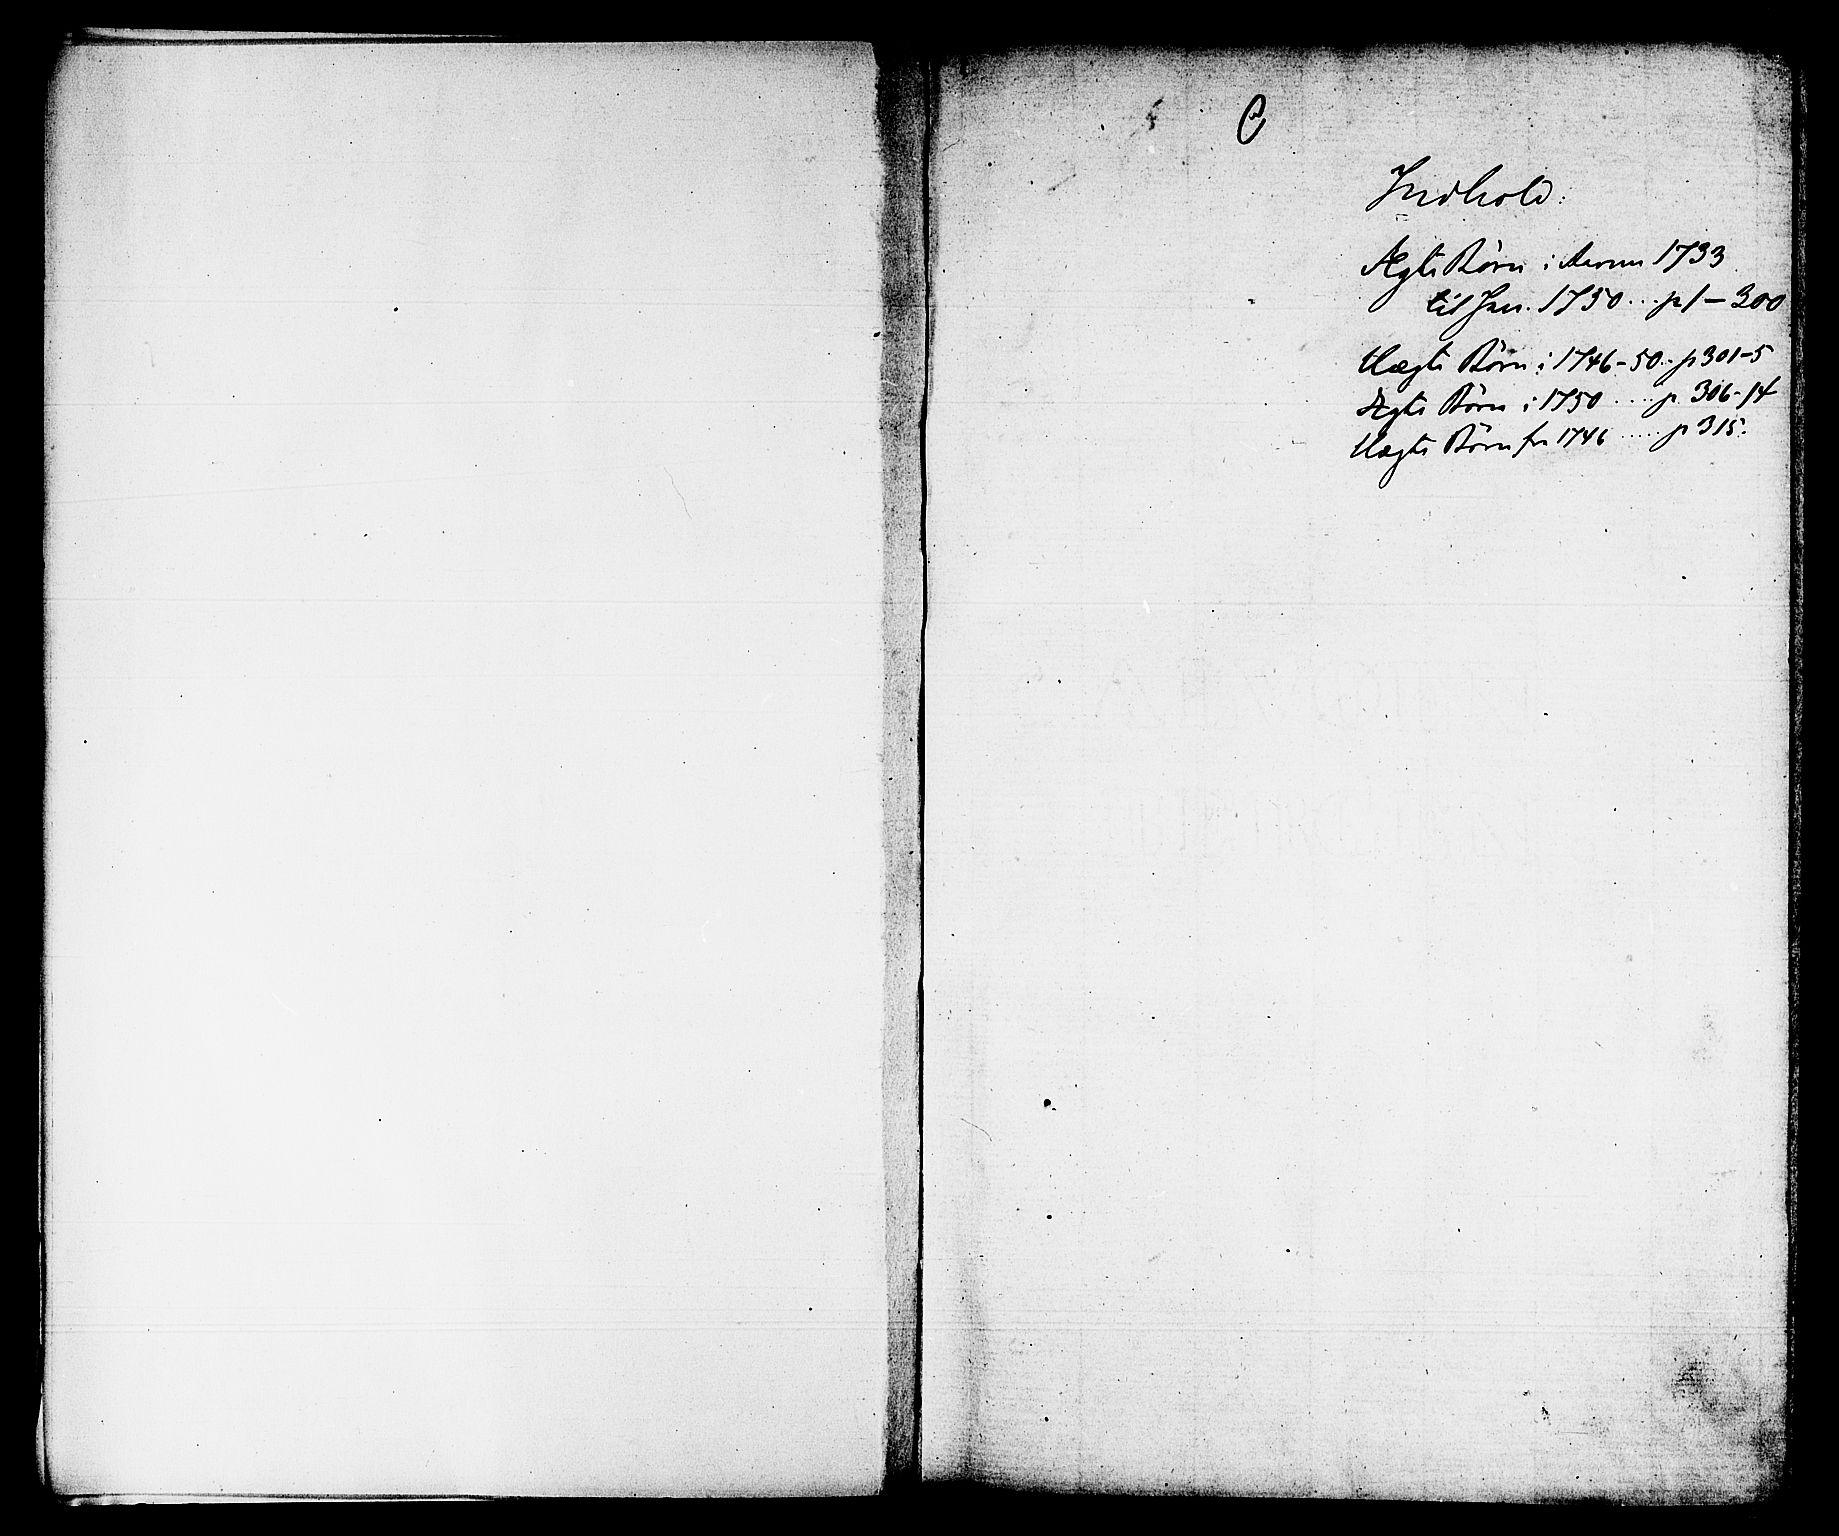 SAB, Domkirken Sokneprestembete, H/Haa/L0002: Ministerialbok nr. A 2, 1733-1750